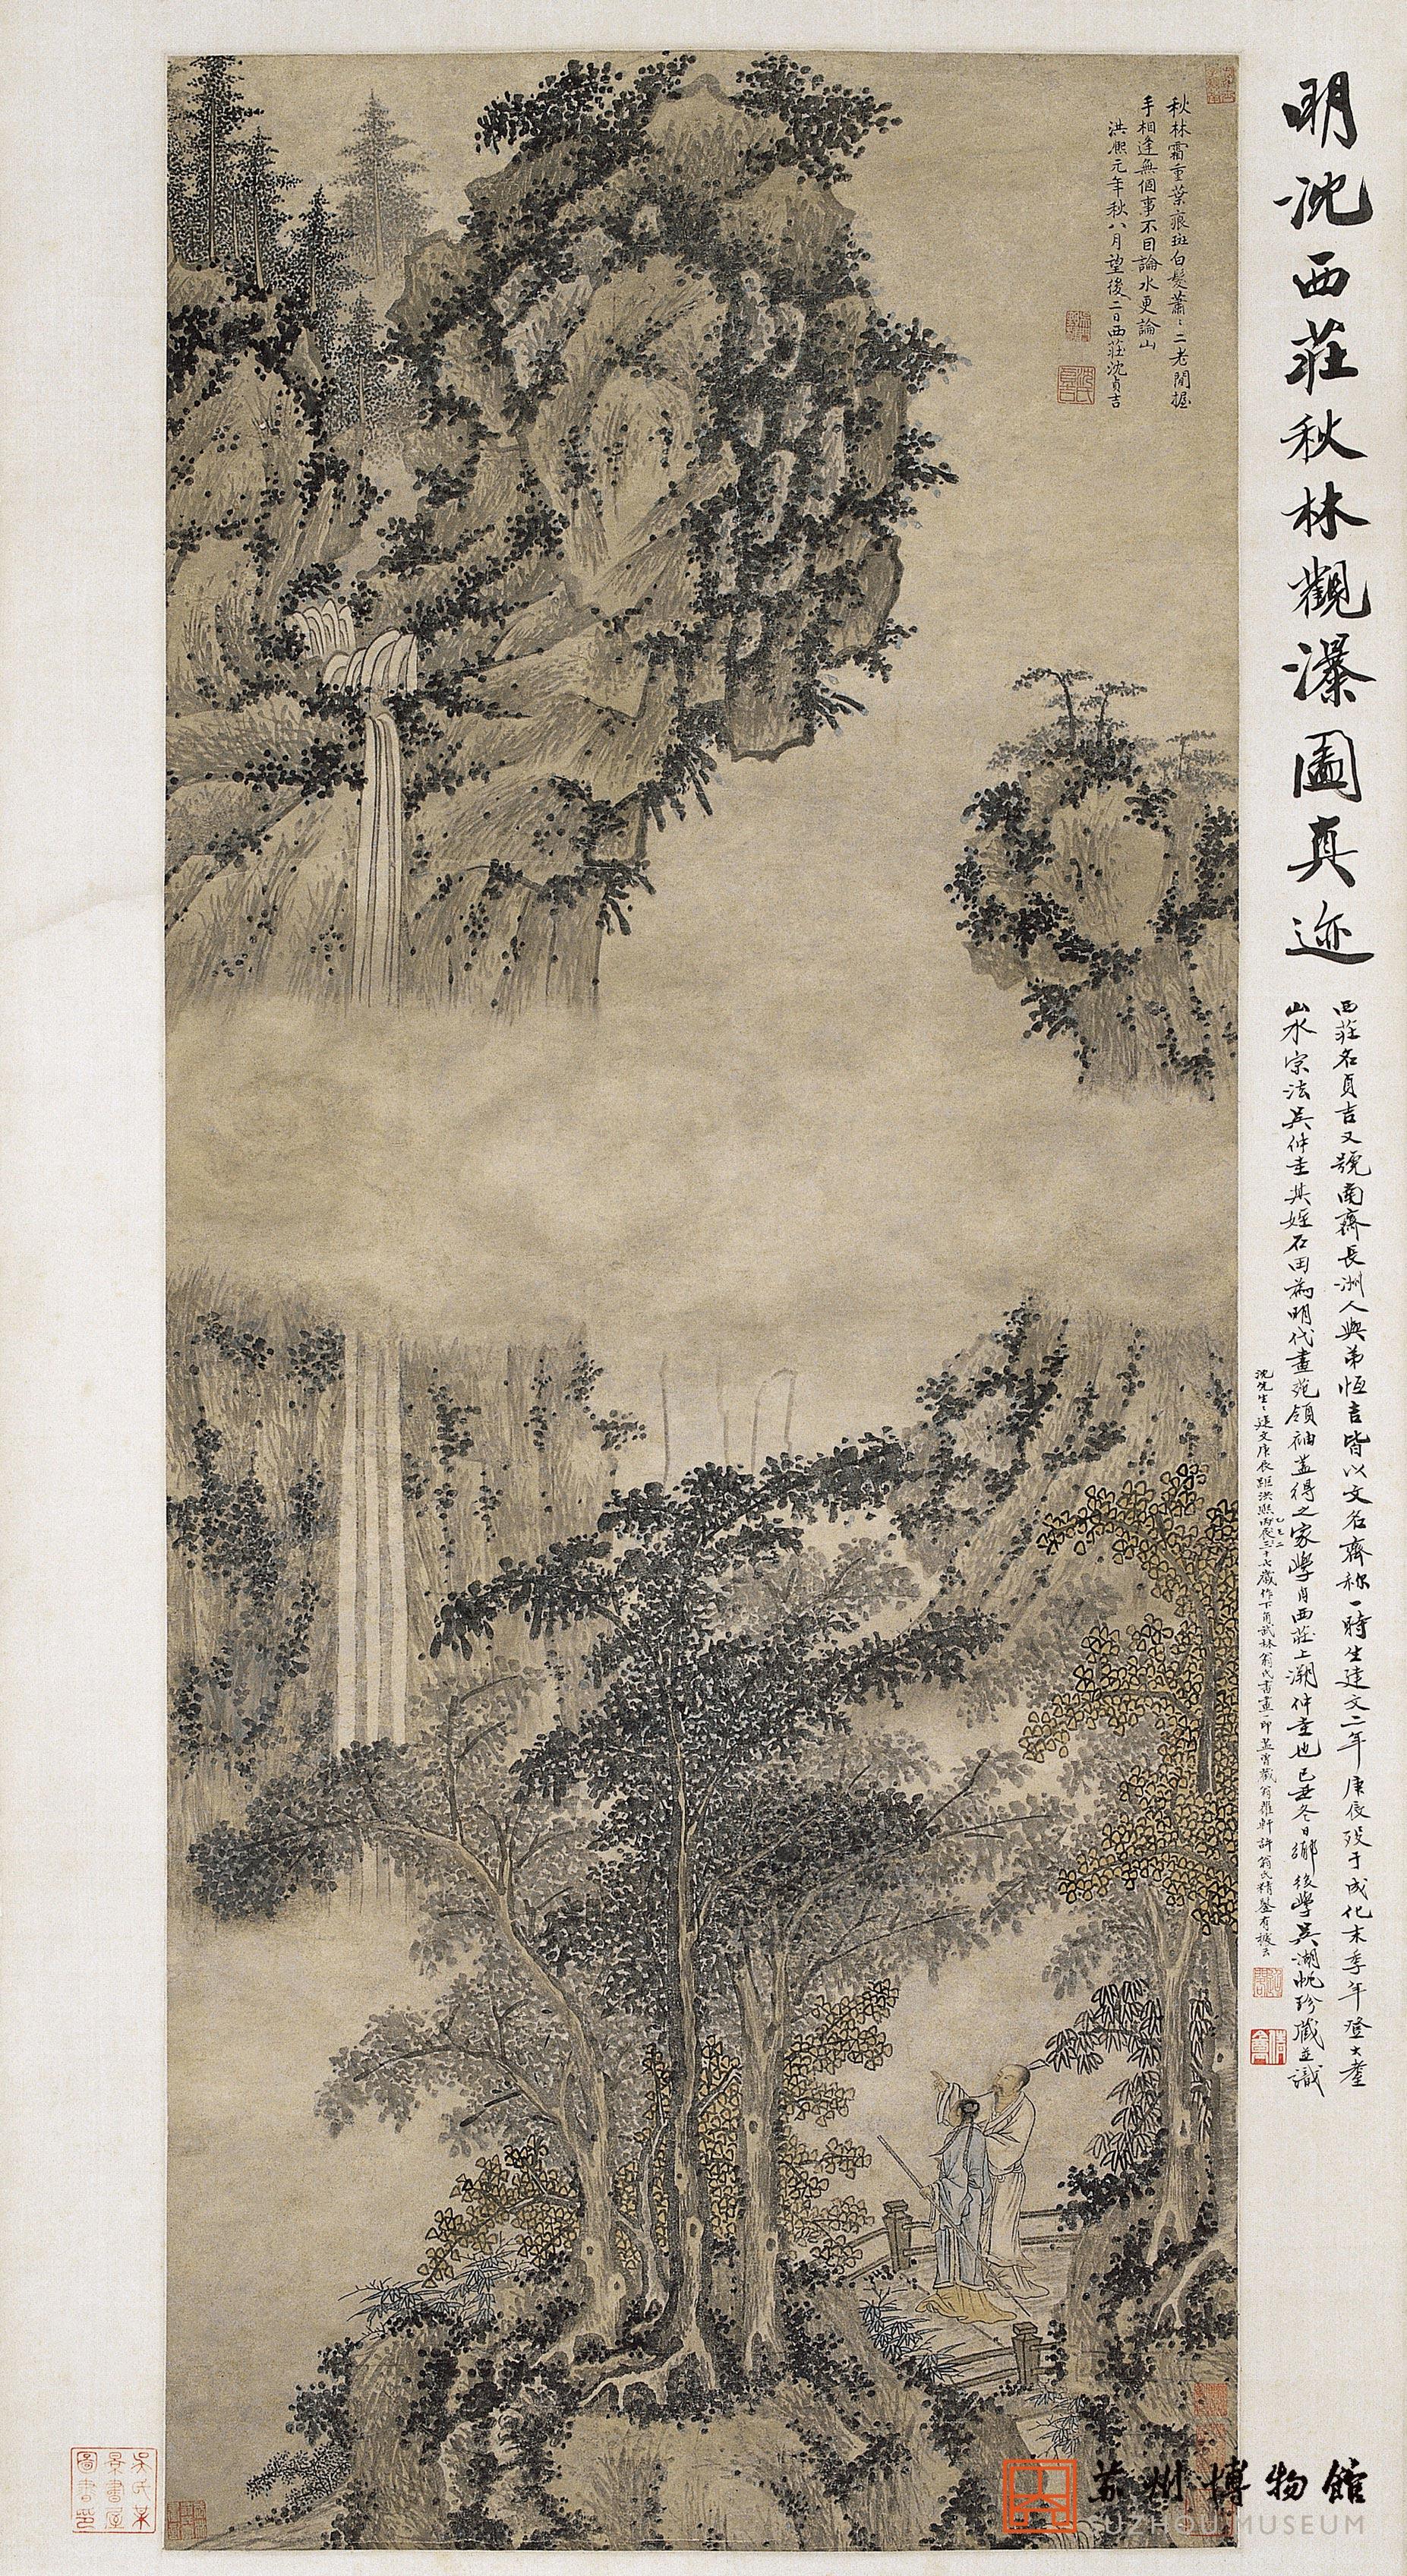 SZML-1056_P28-003-沈贞吉-秋林观瀑图轴_调整大小_shuiyin.jpg